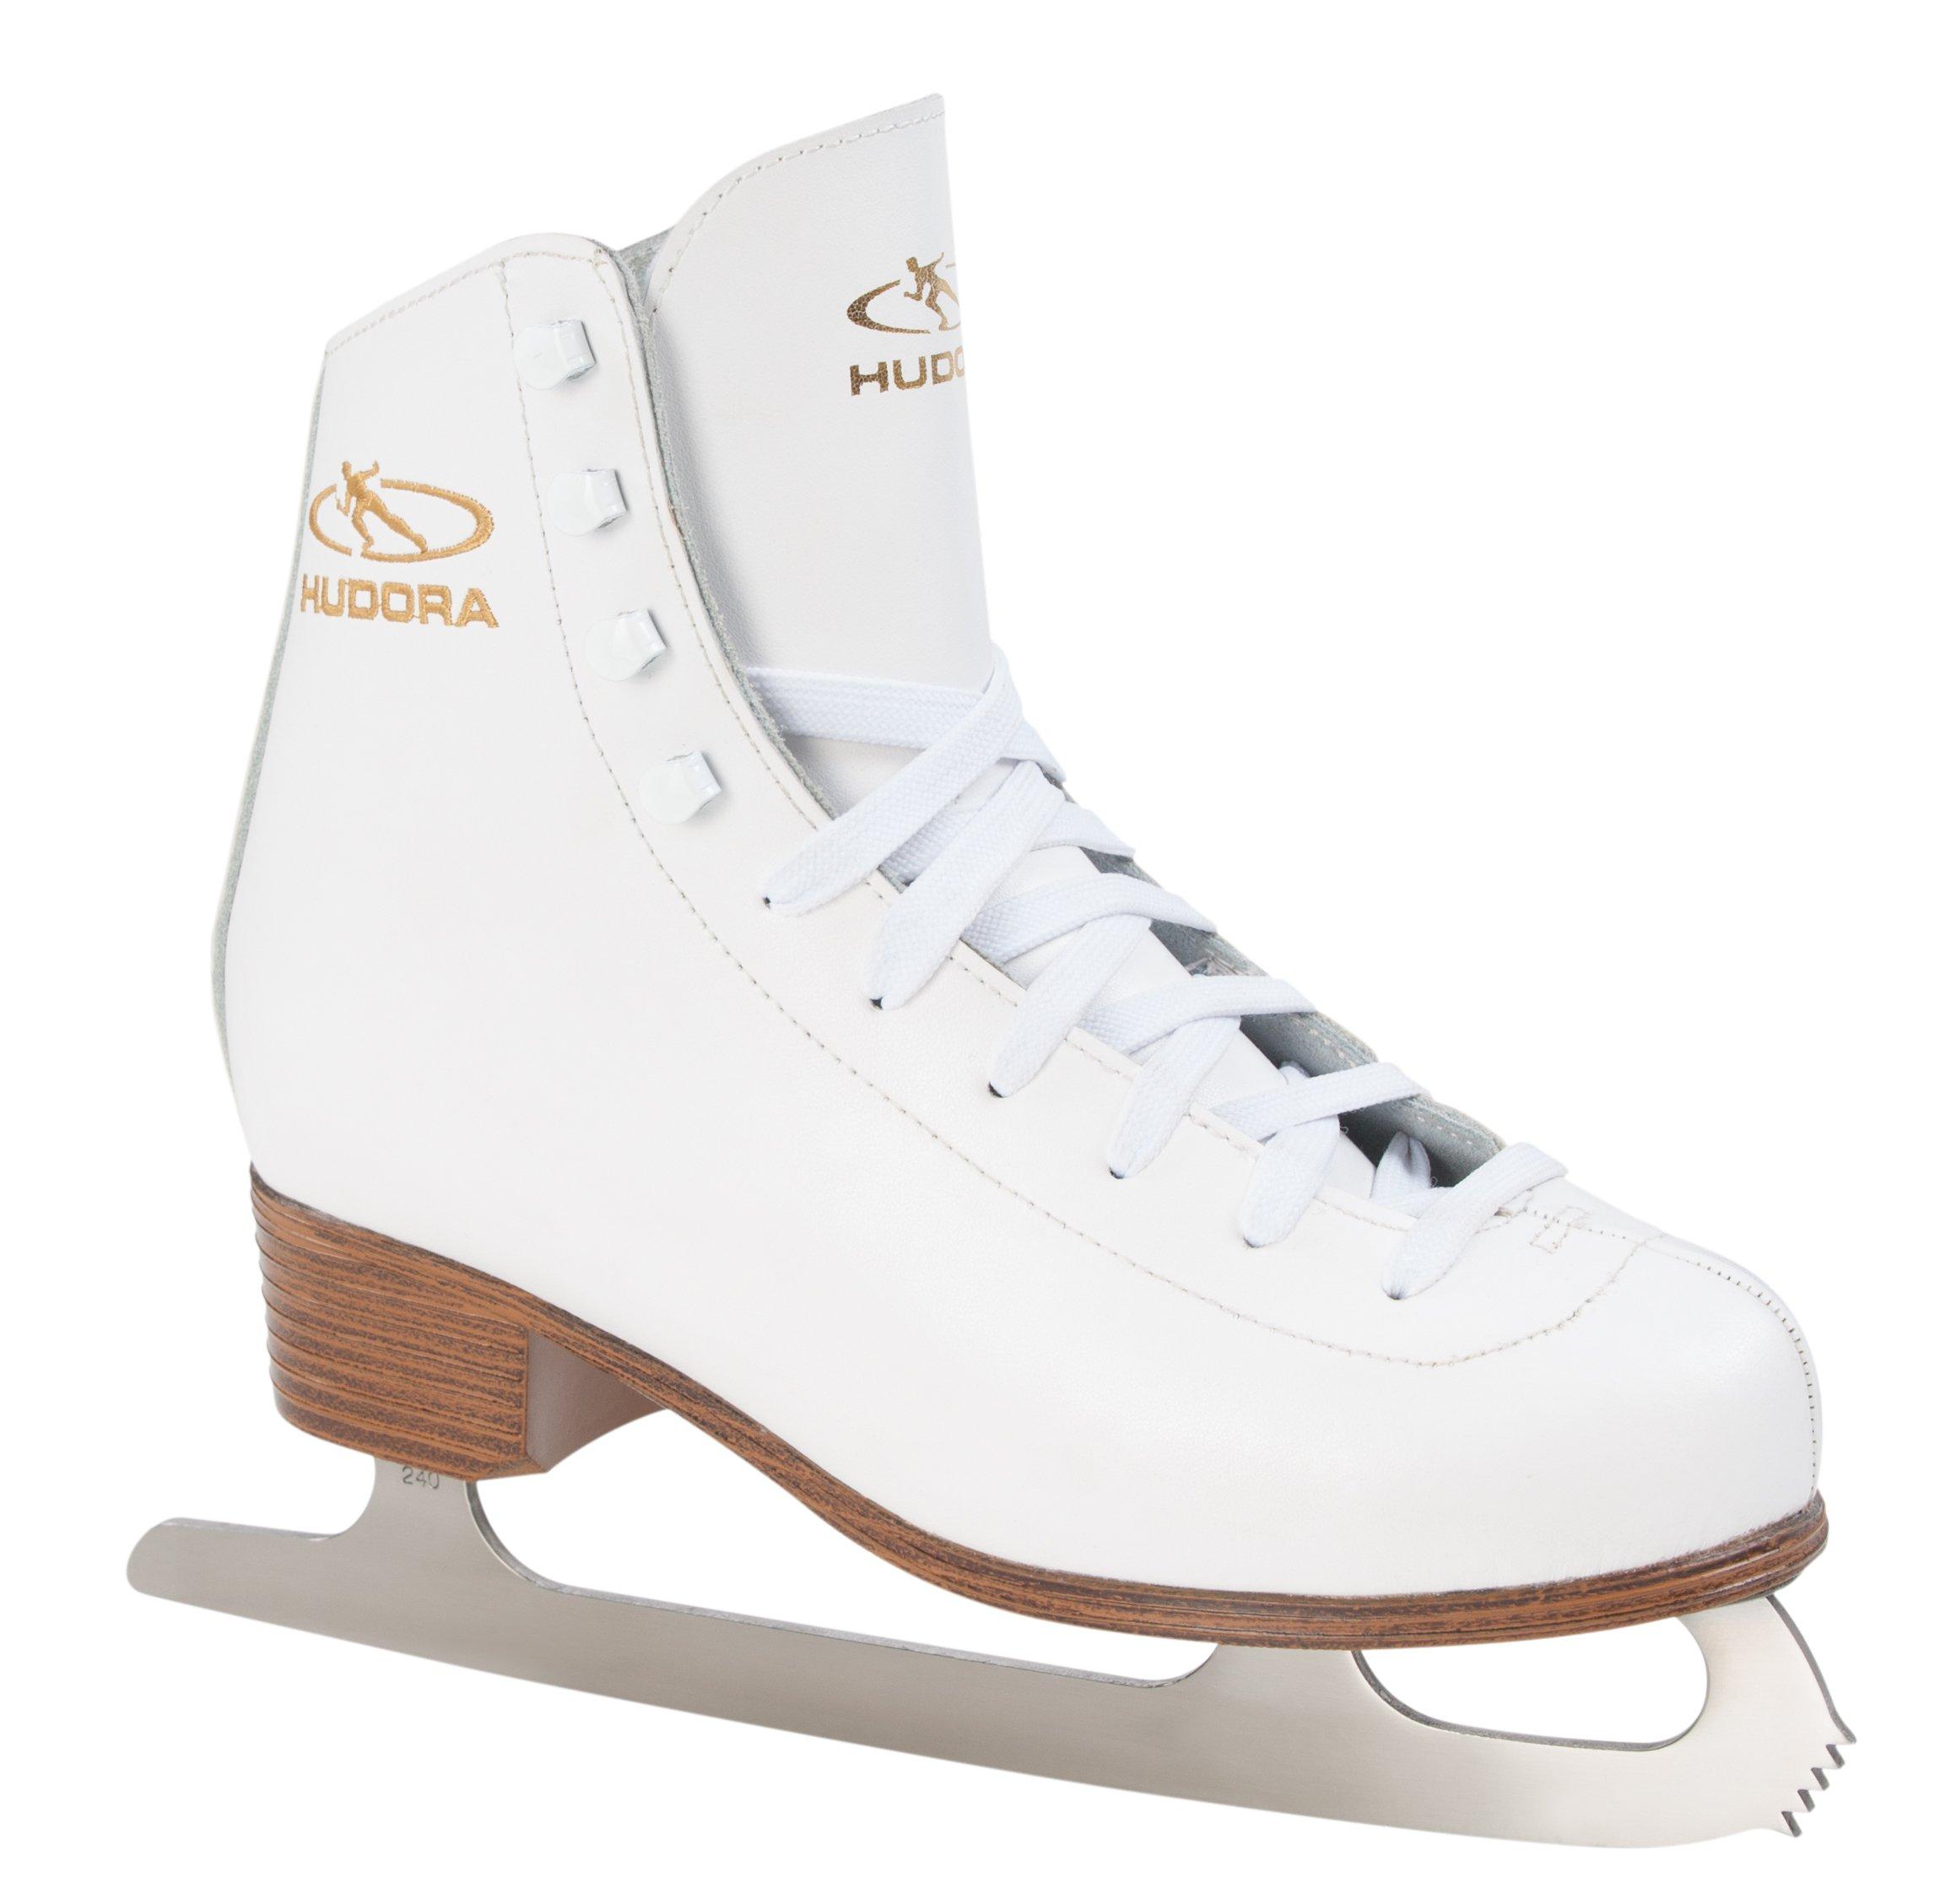 HUDORA ''Laura Ice Skates Set, Size 6, 5, White